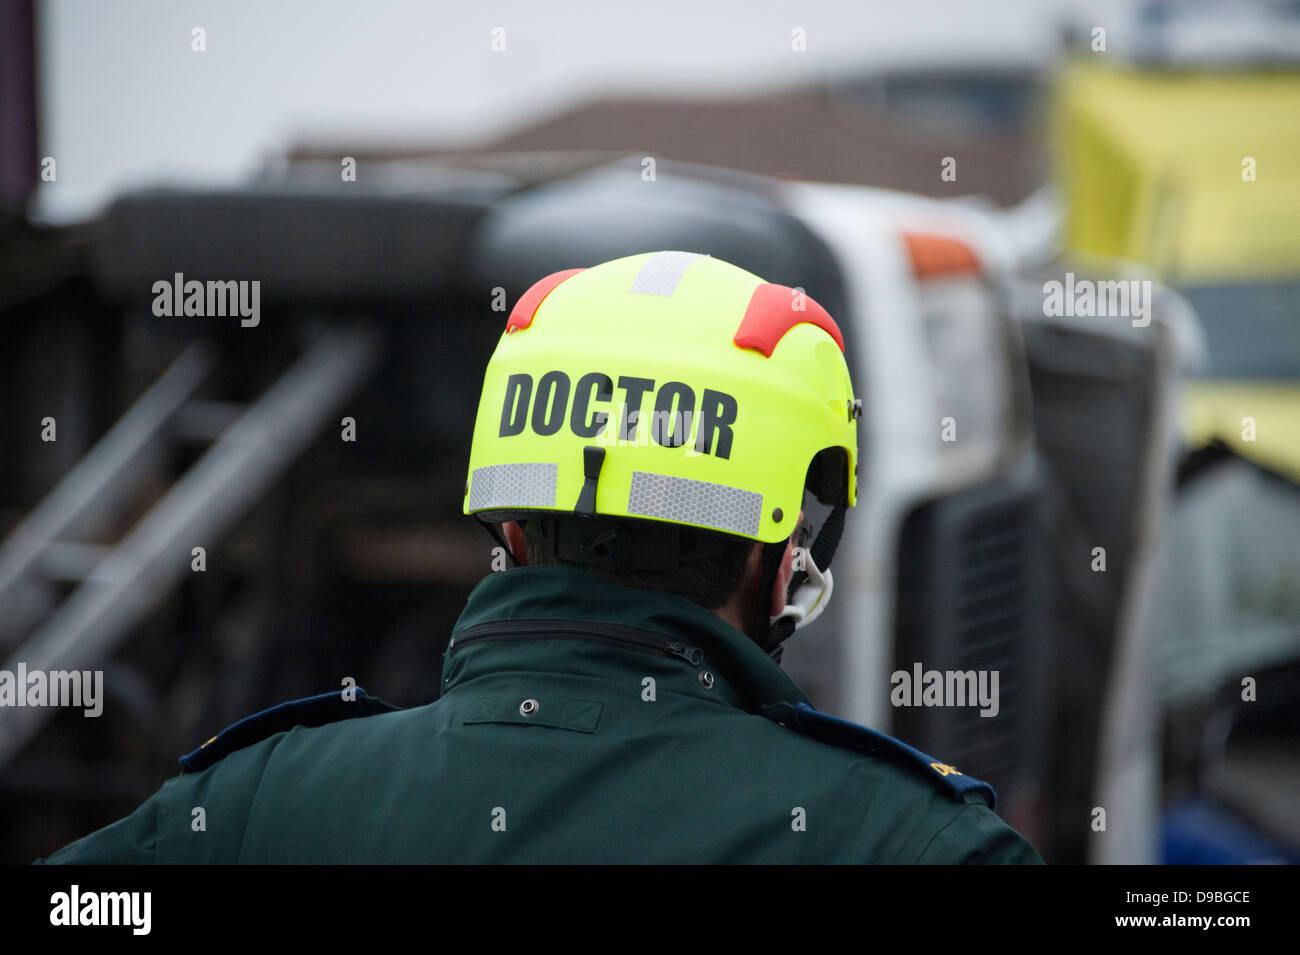 Doctor Paramedic PPE Hard Hat Helmet - Stock Image